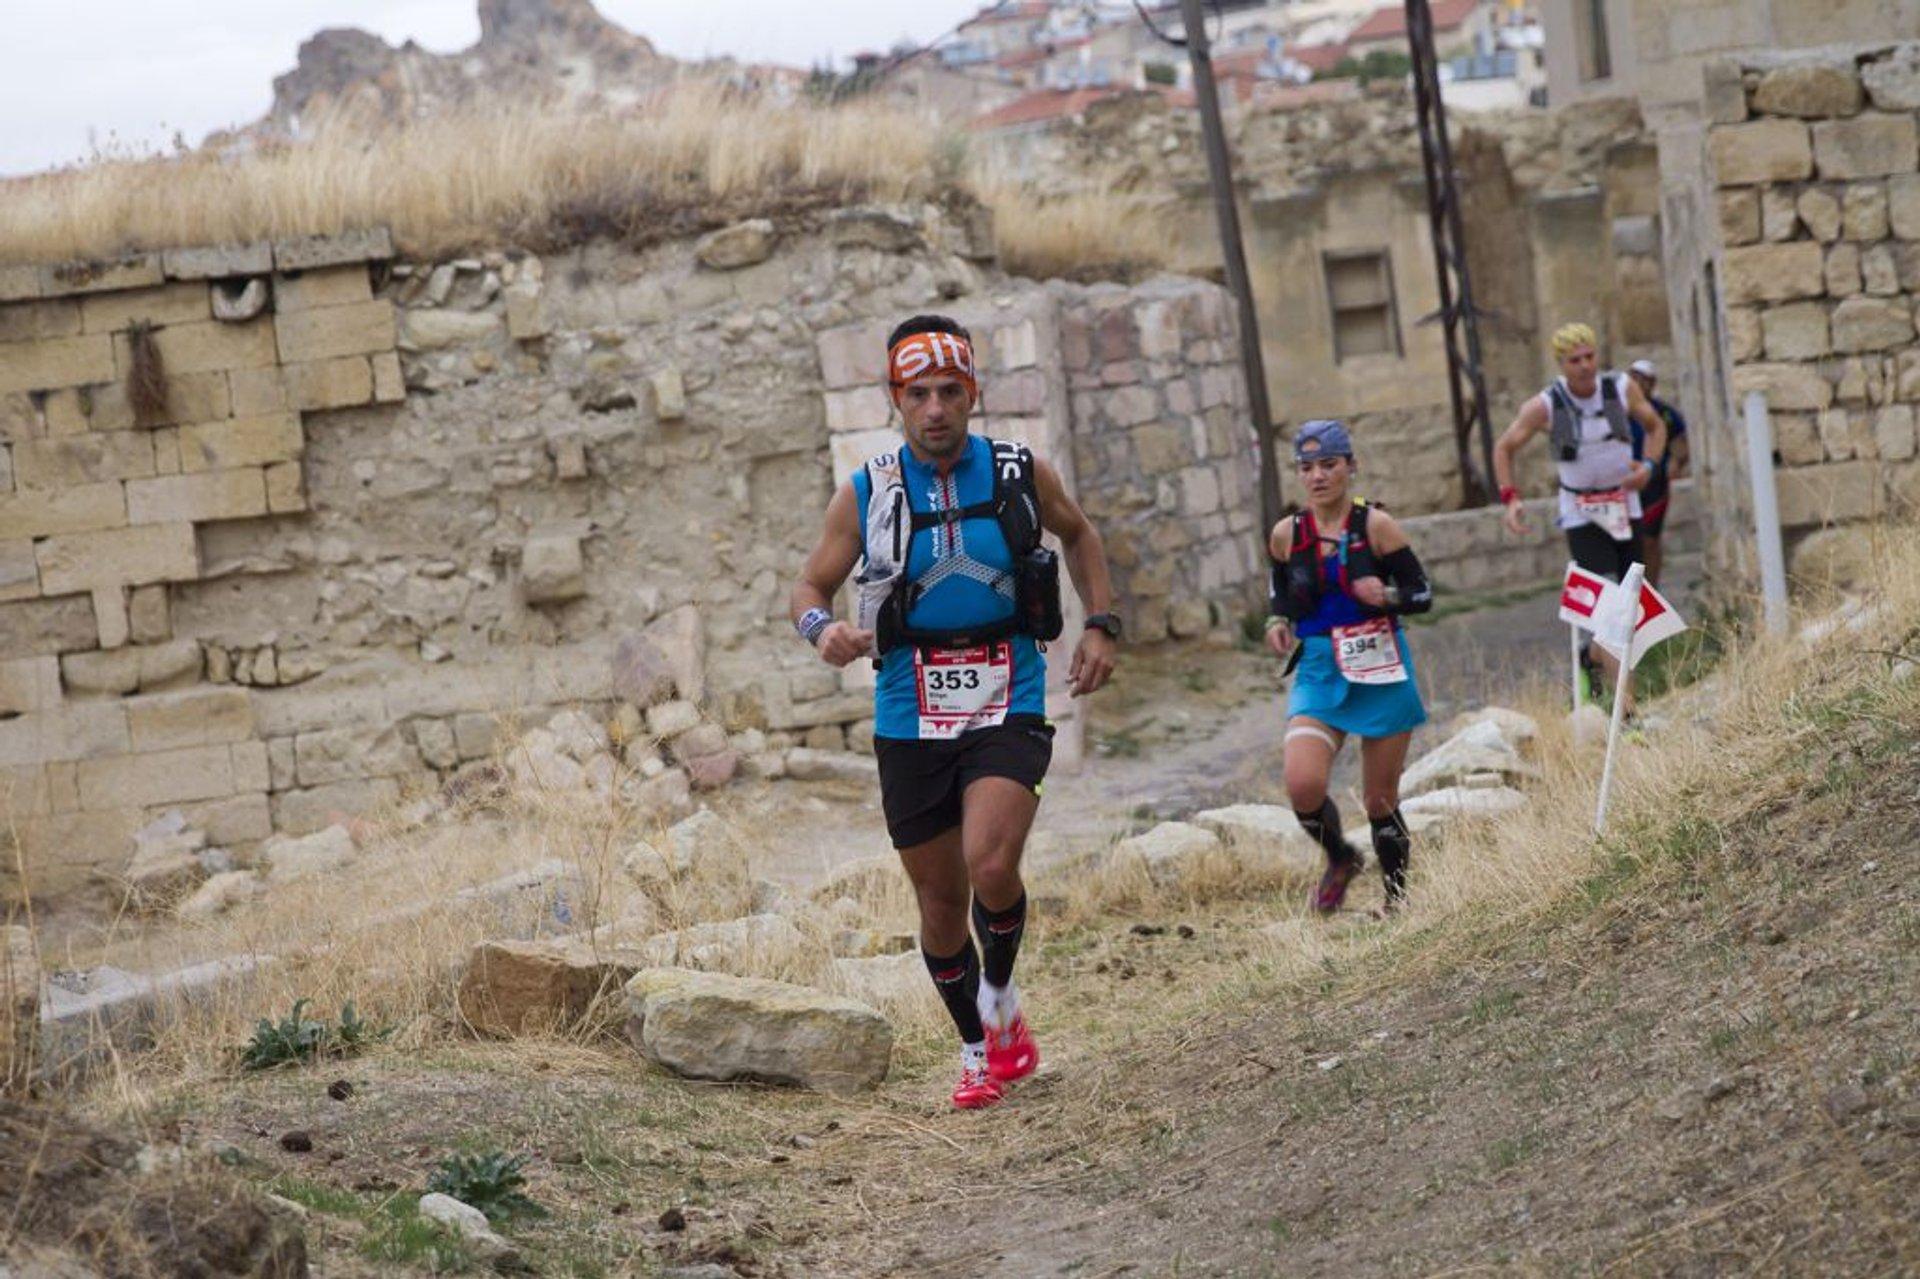 Best time for Cappadocia Ultra Trail in Cappadocia 2019